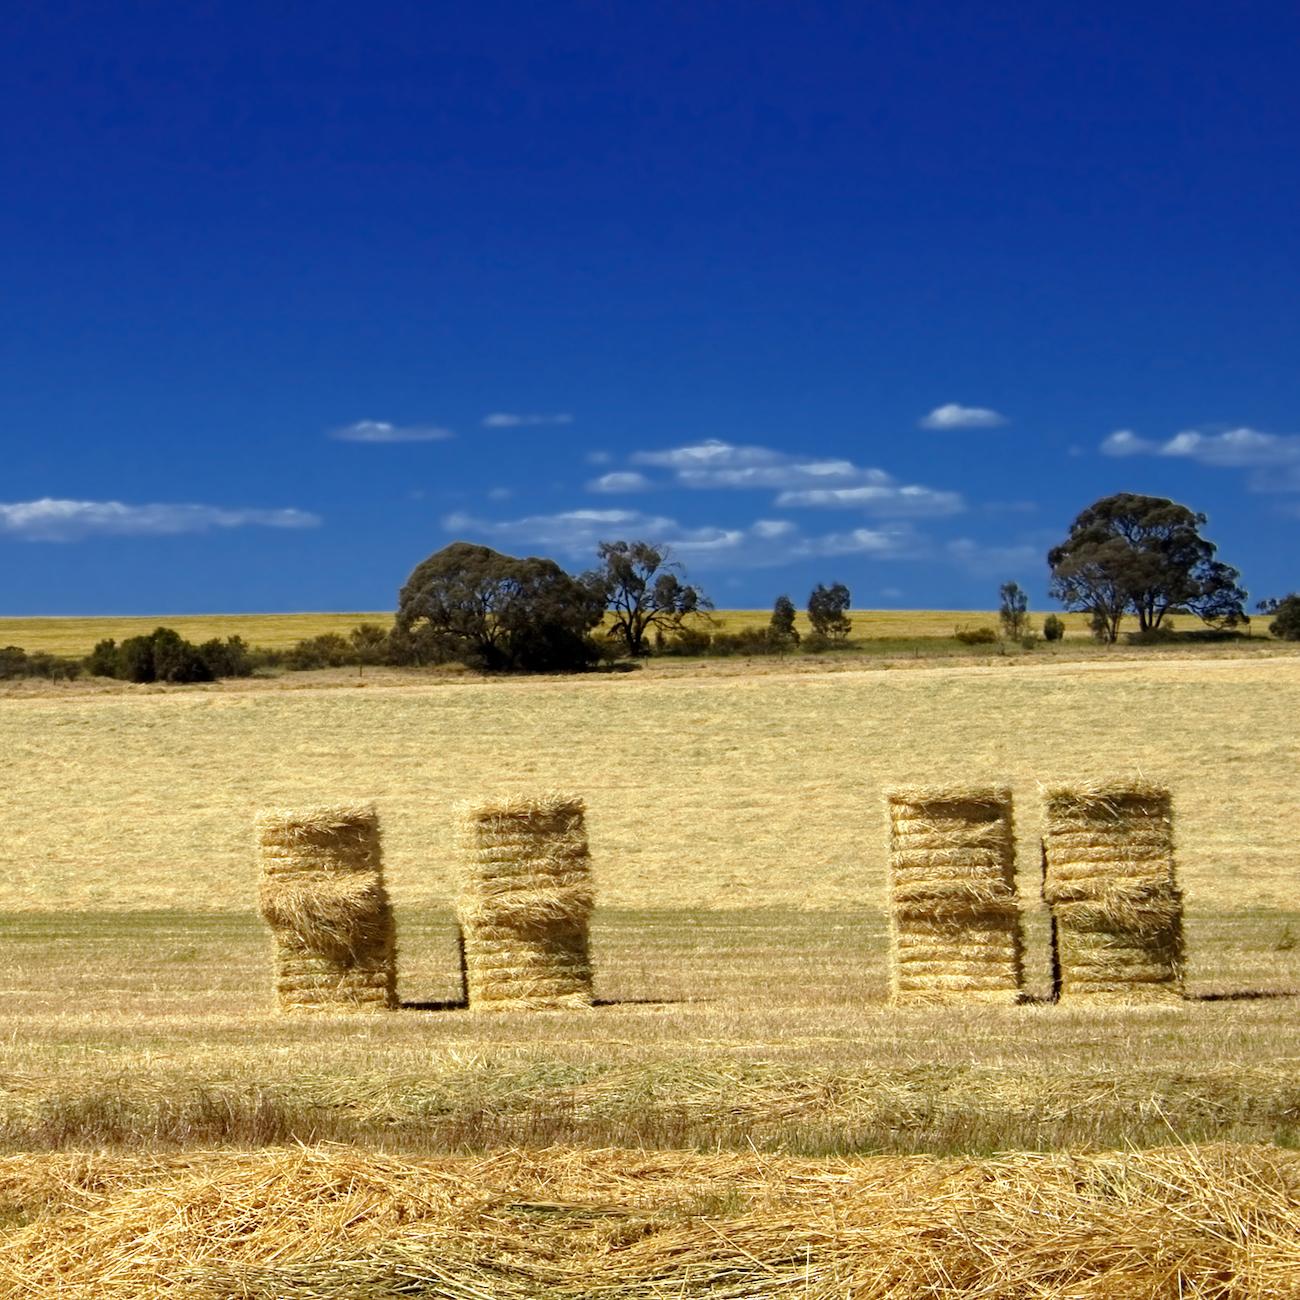 Square Bale Twine, Agri Novatex Australia